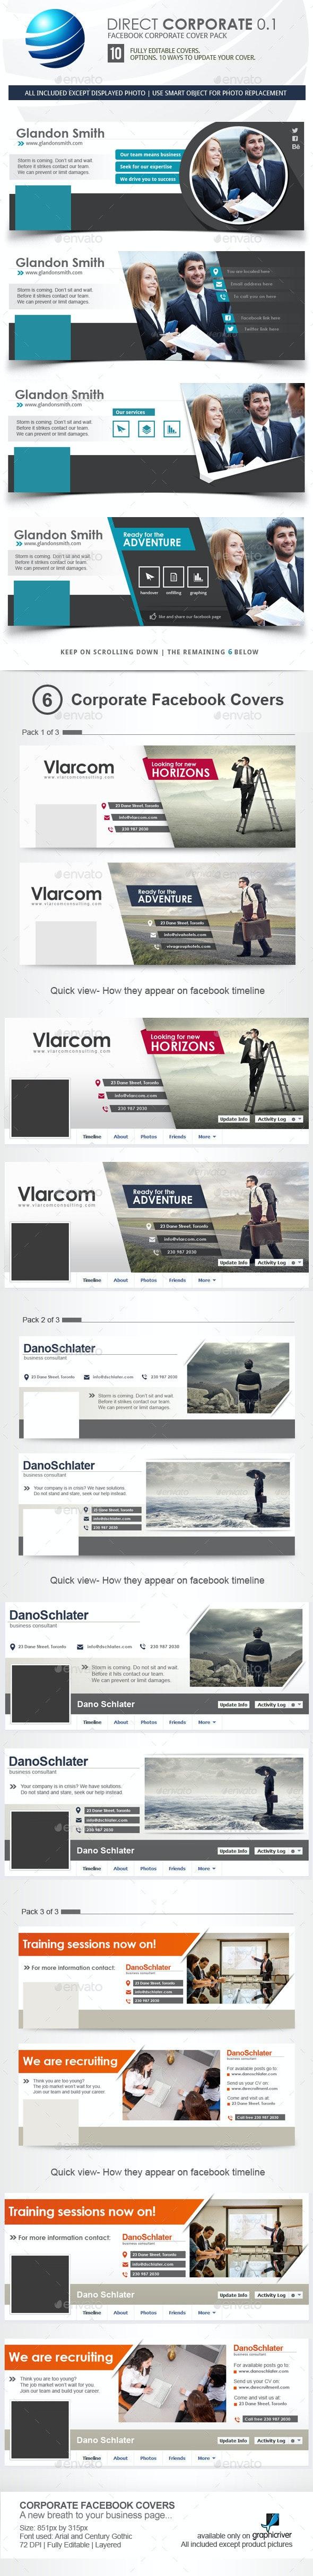 Corporate Facebook Timeline Covers - Facebook Timeline Covers Social Media